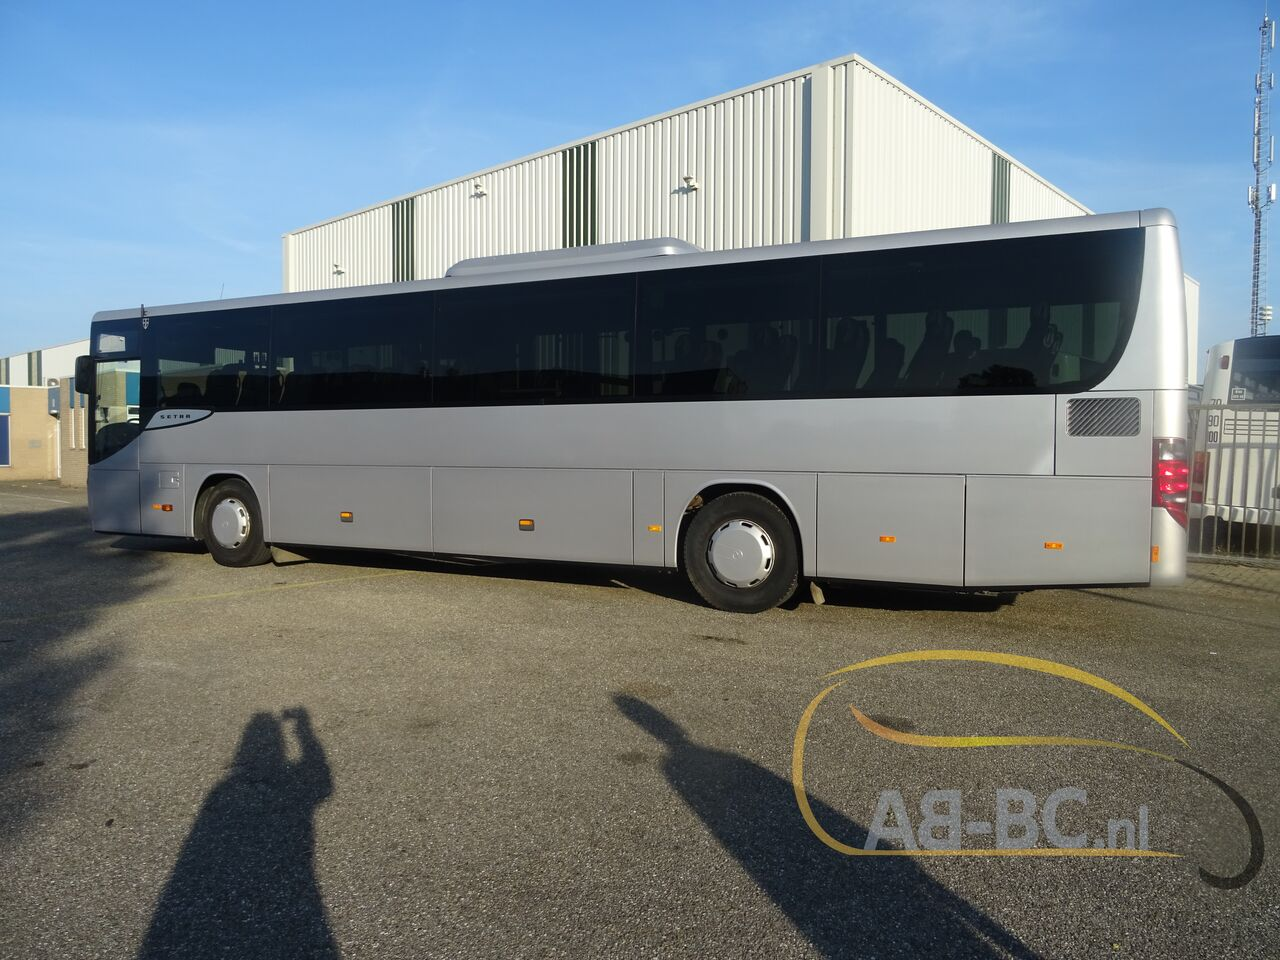 coach-bus-SETRA-S415H-52-Seats-EURO-6-Liftbus---1630913135417601685_big_35a110e58657e50990e132fefa720c9b--21070517141280735500